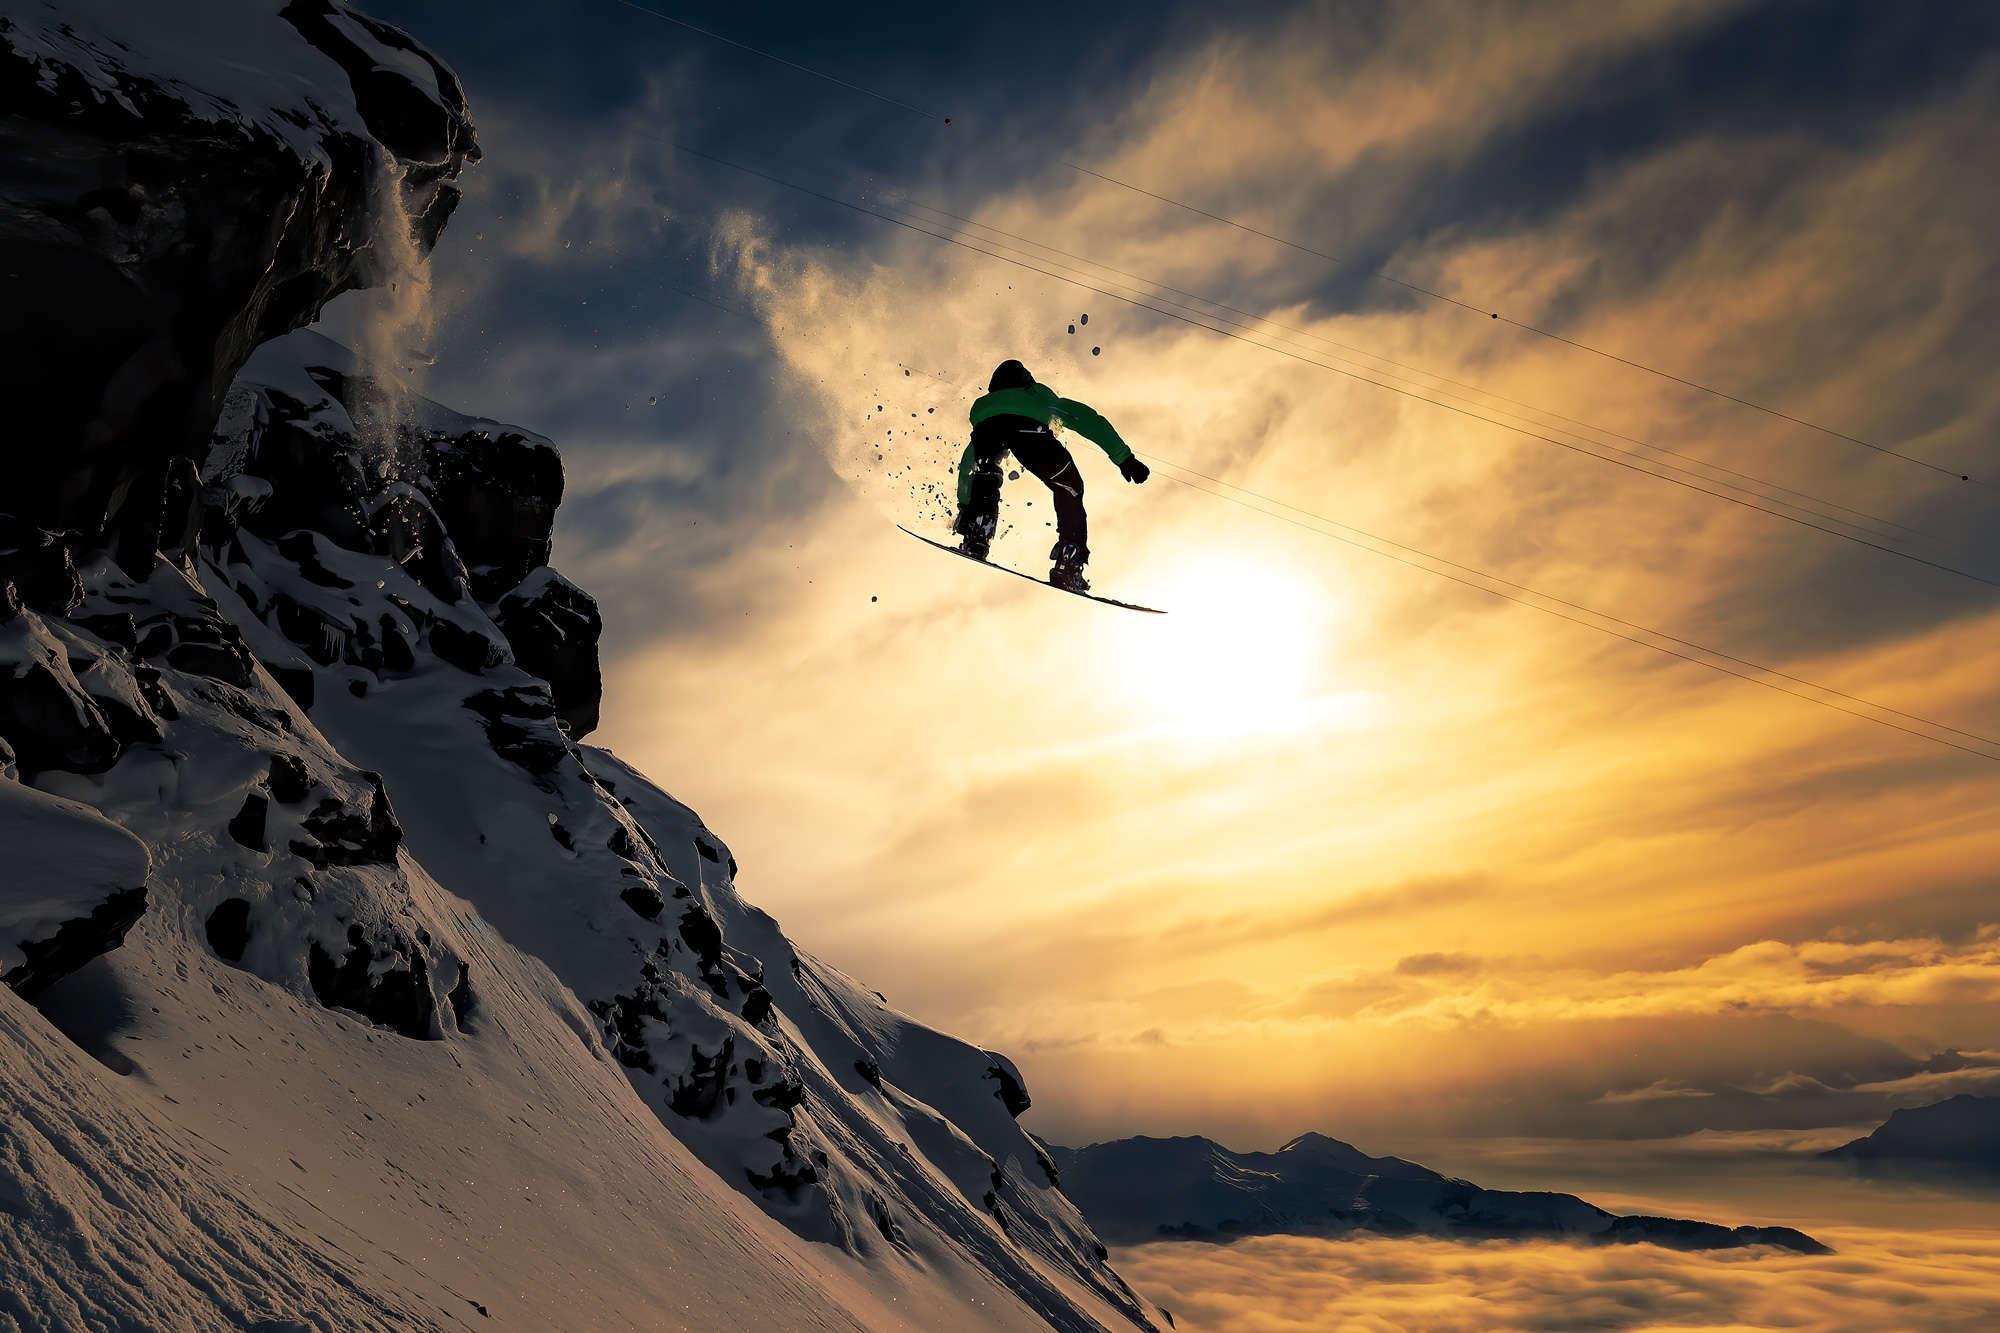 Jakob Sanne - Air and Snow